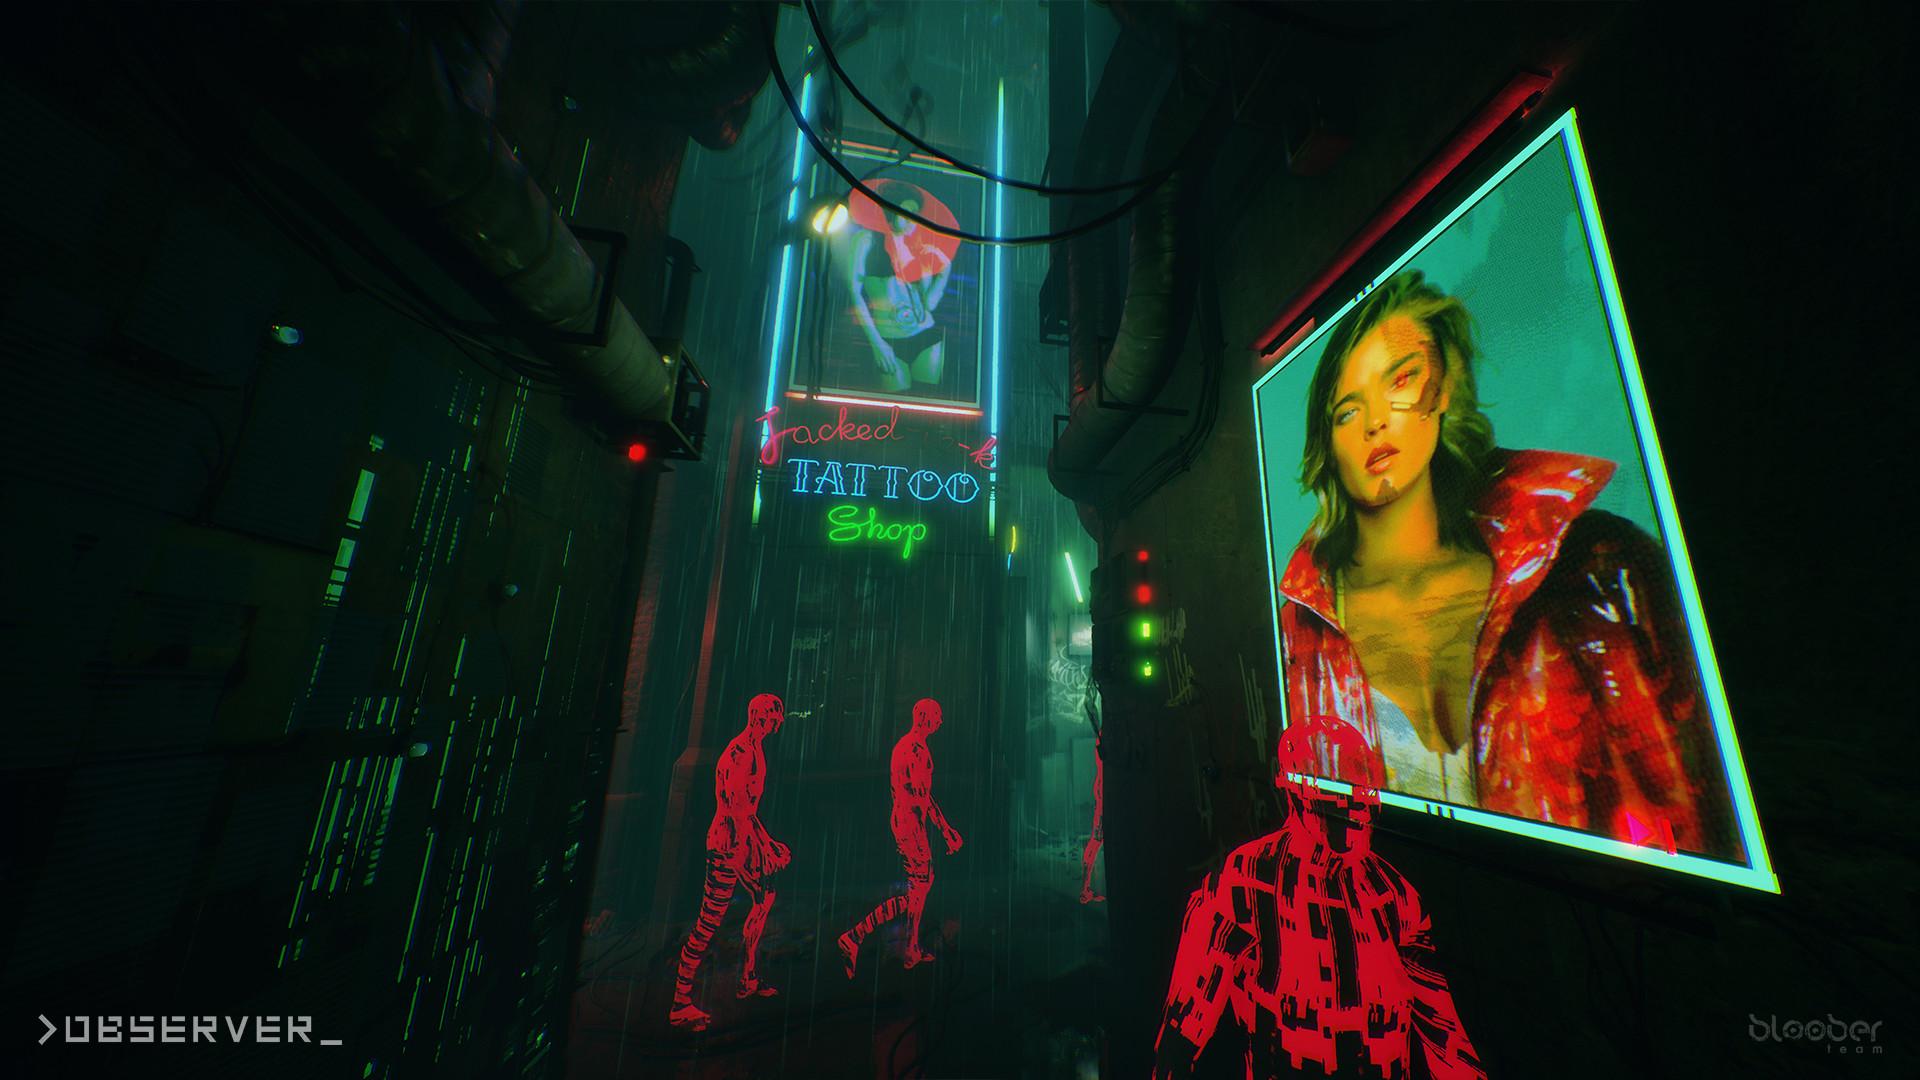 Observer, una pesadilla cyberpunk hecha videojuego